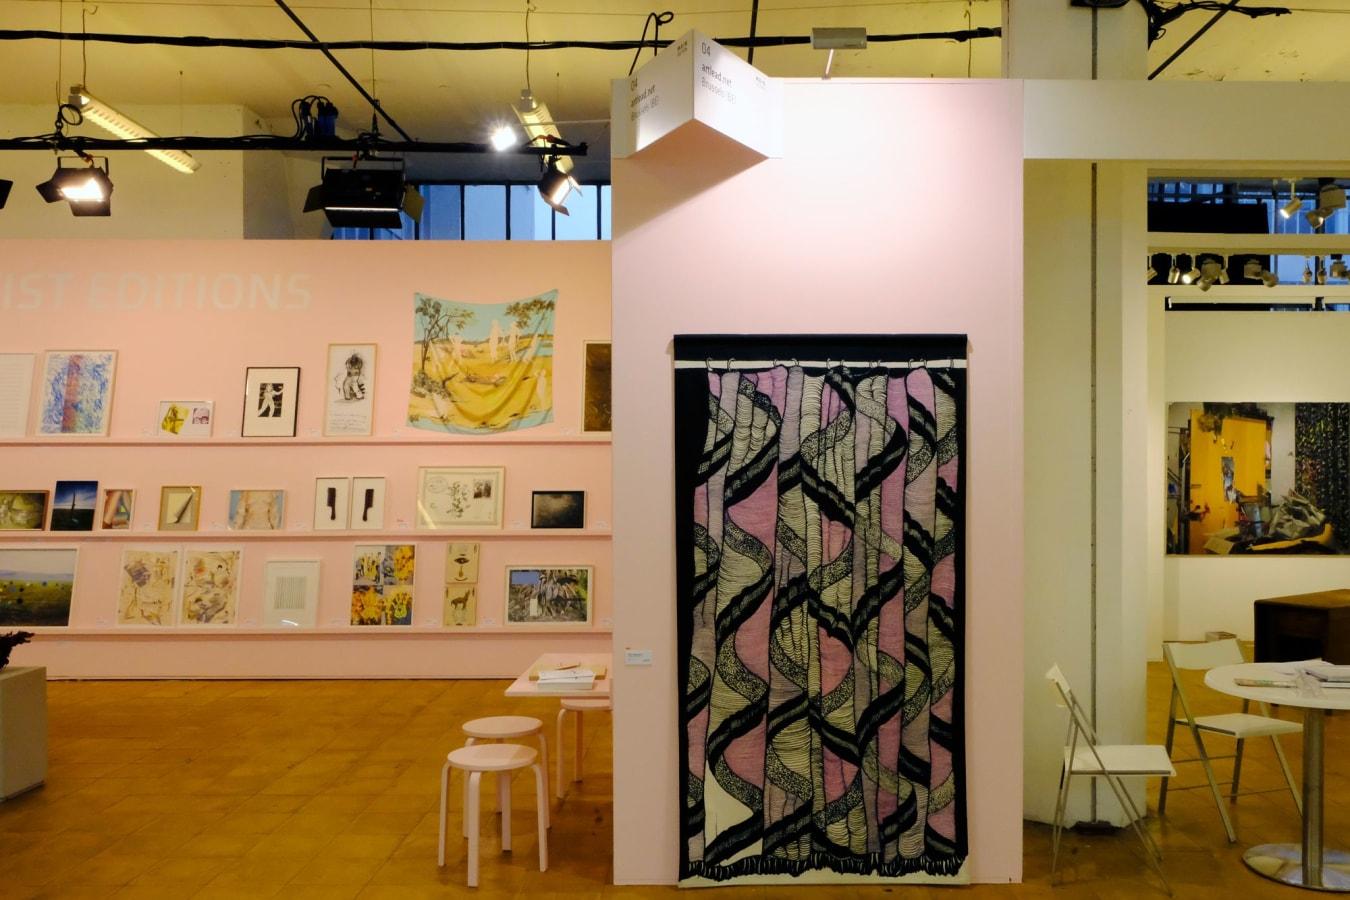 Art Rotterdam 2019, John Baldessari, Catherine Biocca, Aline Bouvy, Bas Van den Hurk, Rachel De Joode, Erik Van Lieshout, Max Pinckers, Evelyn Taocheng Wang,